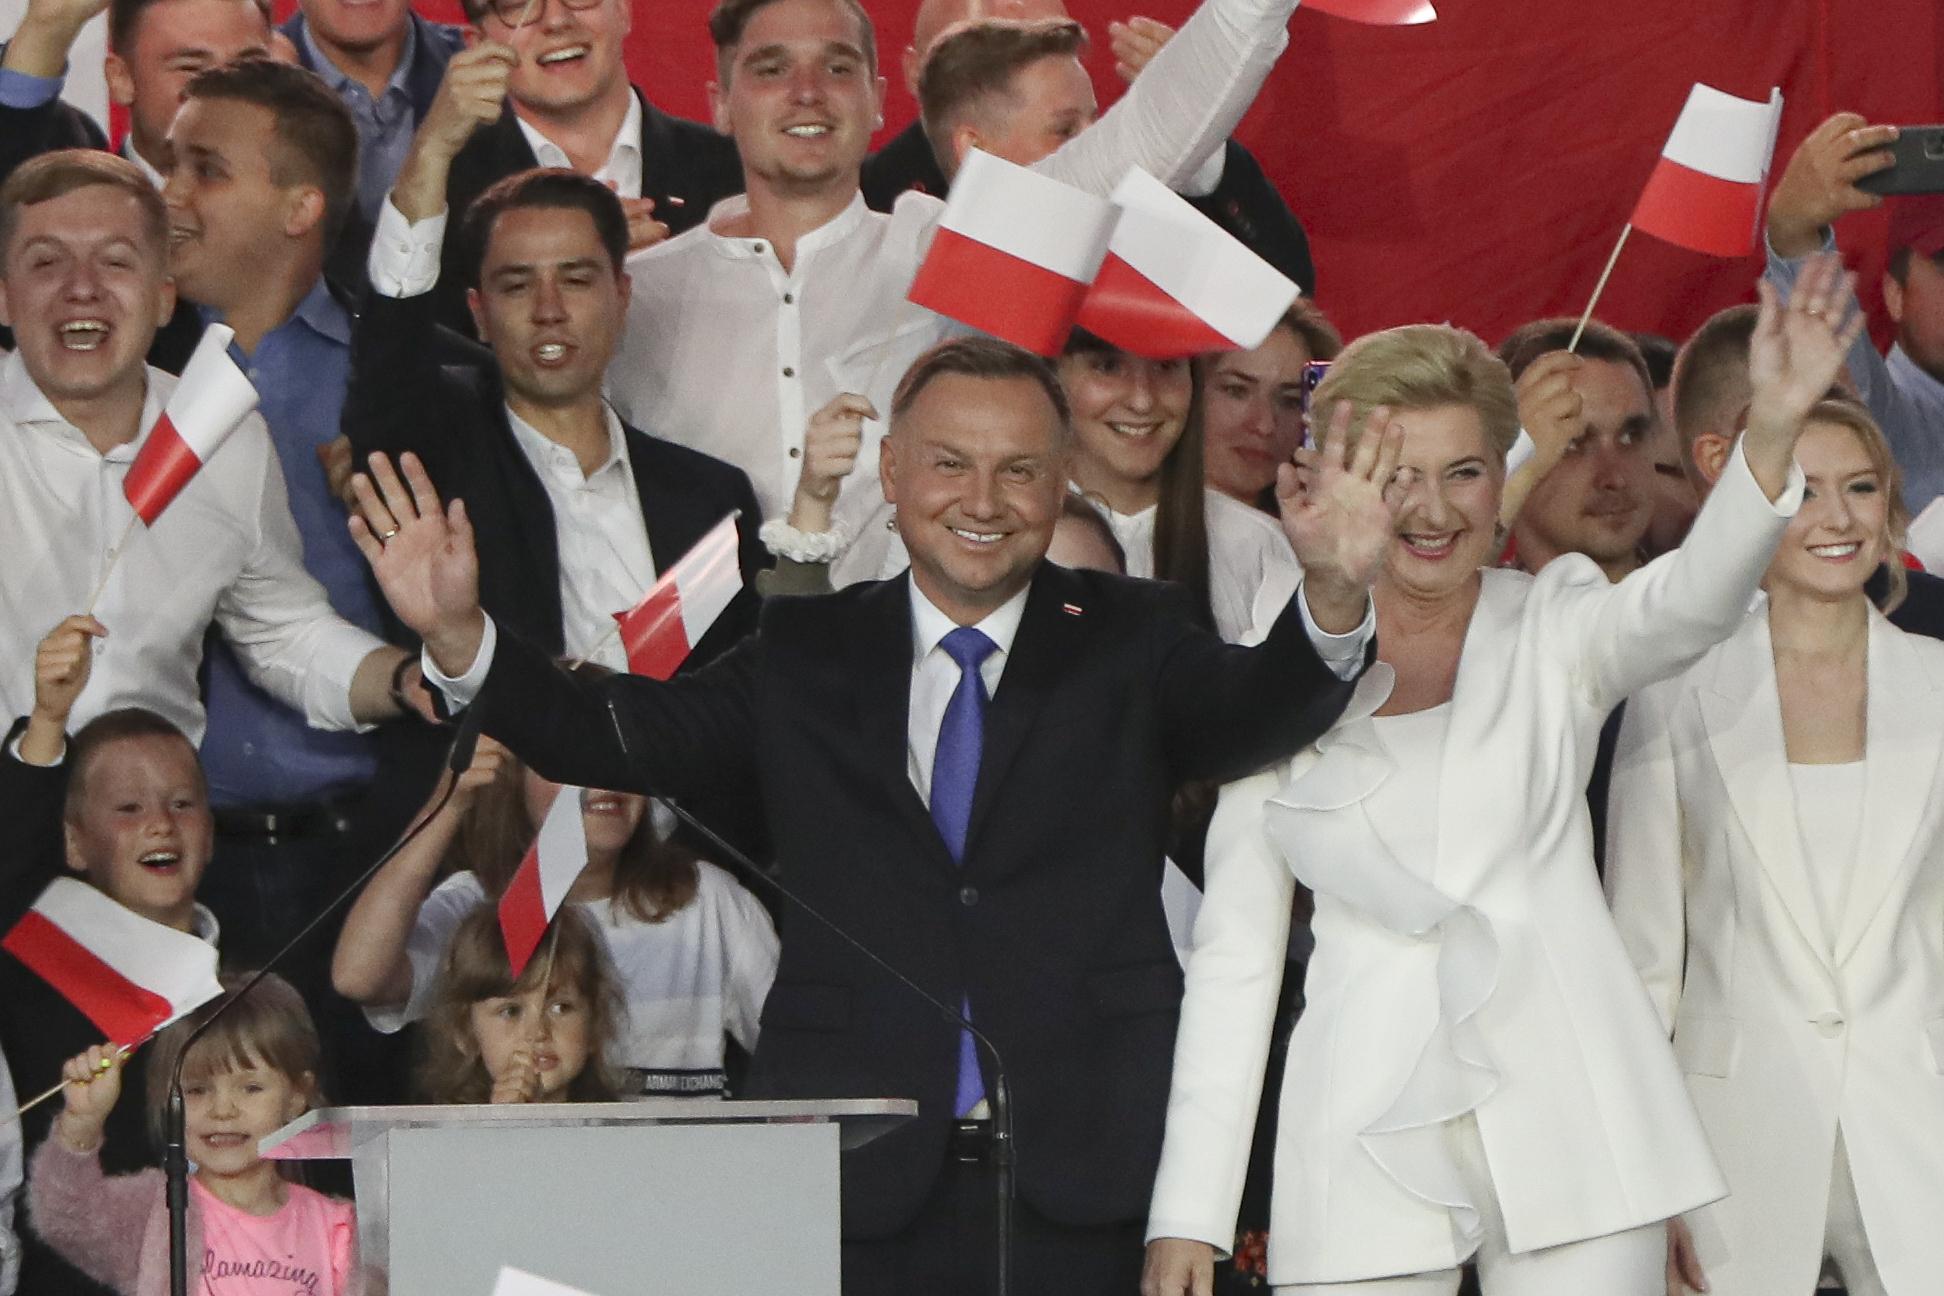 Andrzej Duda, Agata Kornhauser-Duda